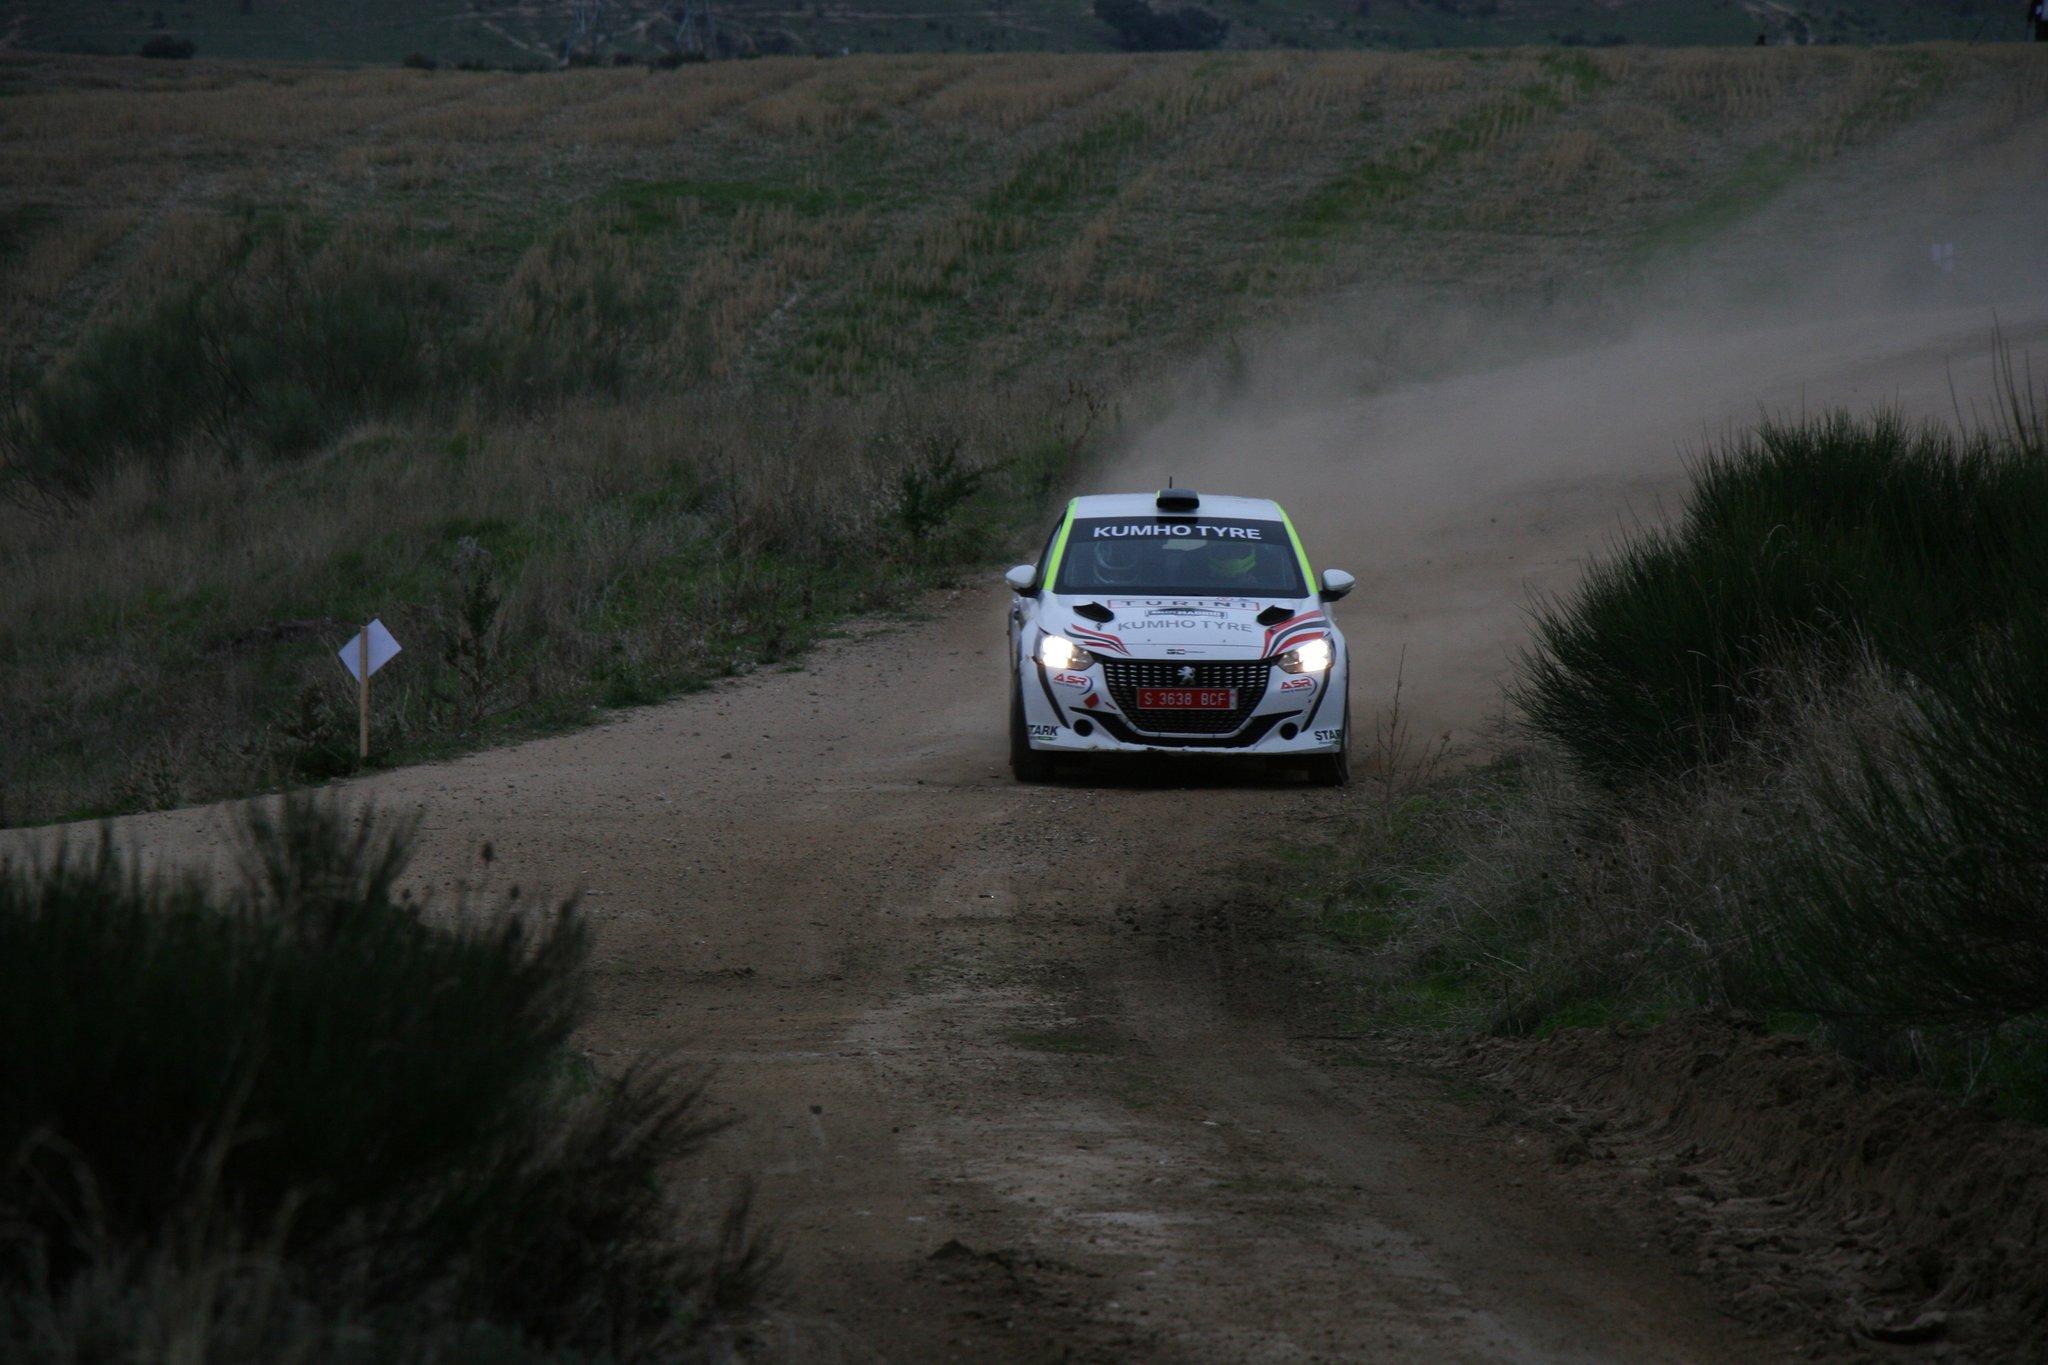 SCER + CERT: Rallye de Tierra de Madrid [13-14 Noviembre] - Página 3 Emx8myNXMAAlHSr?format=jpg&name=large